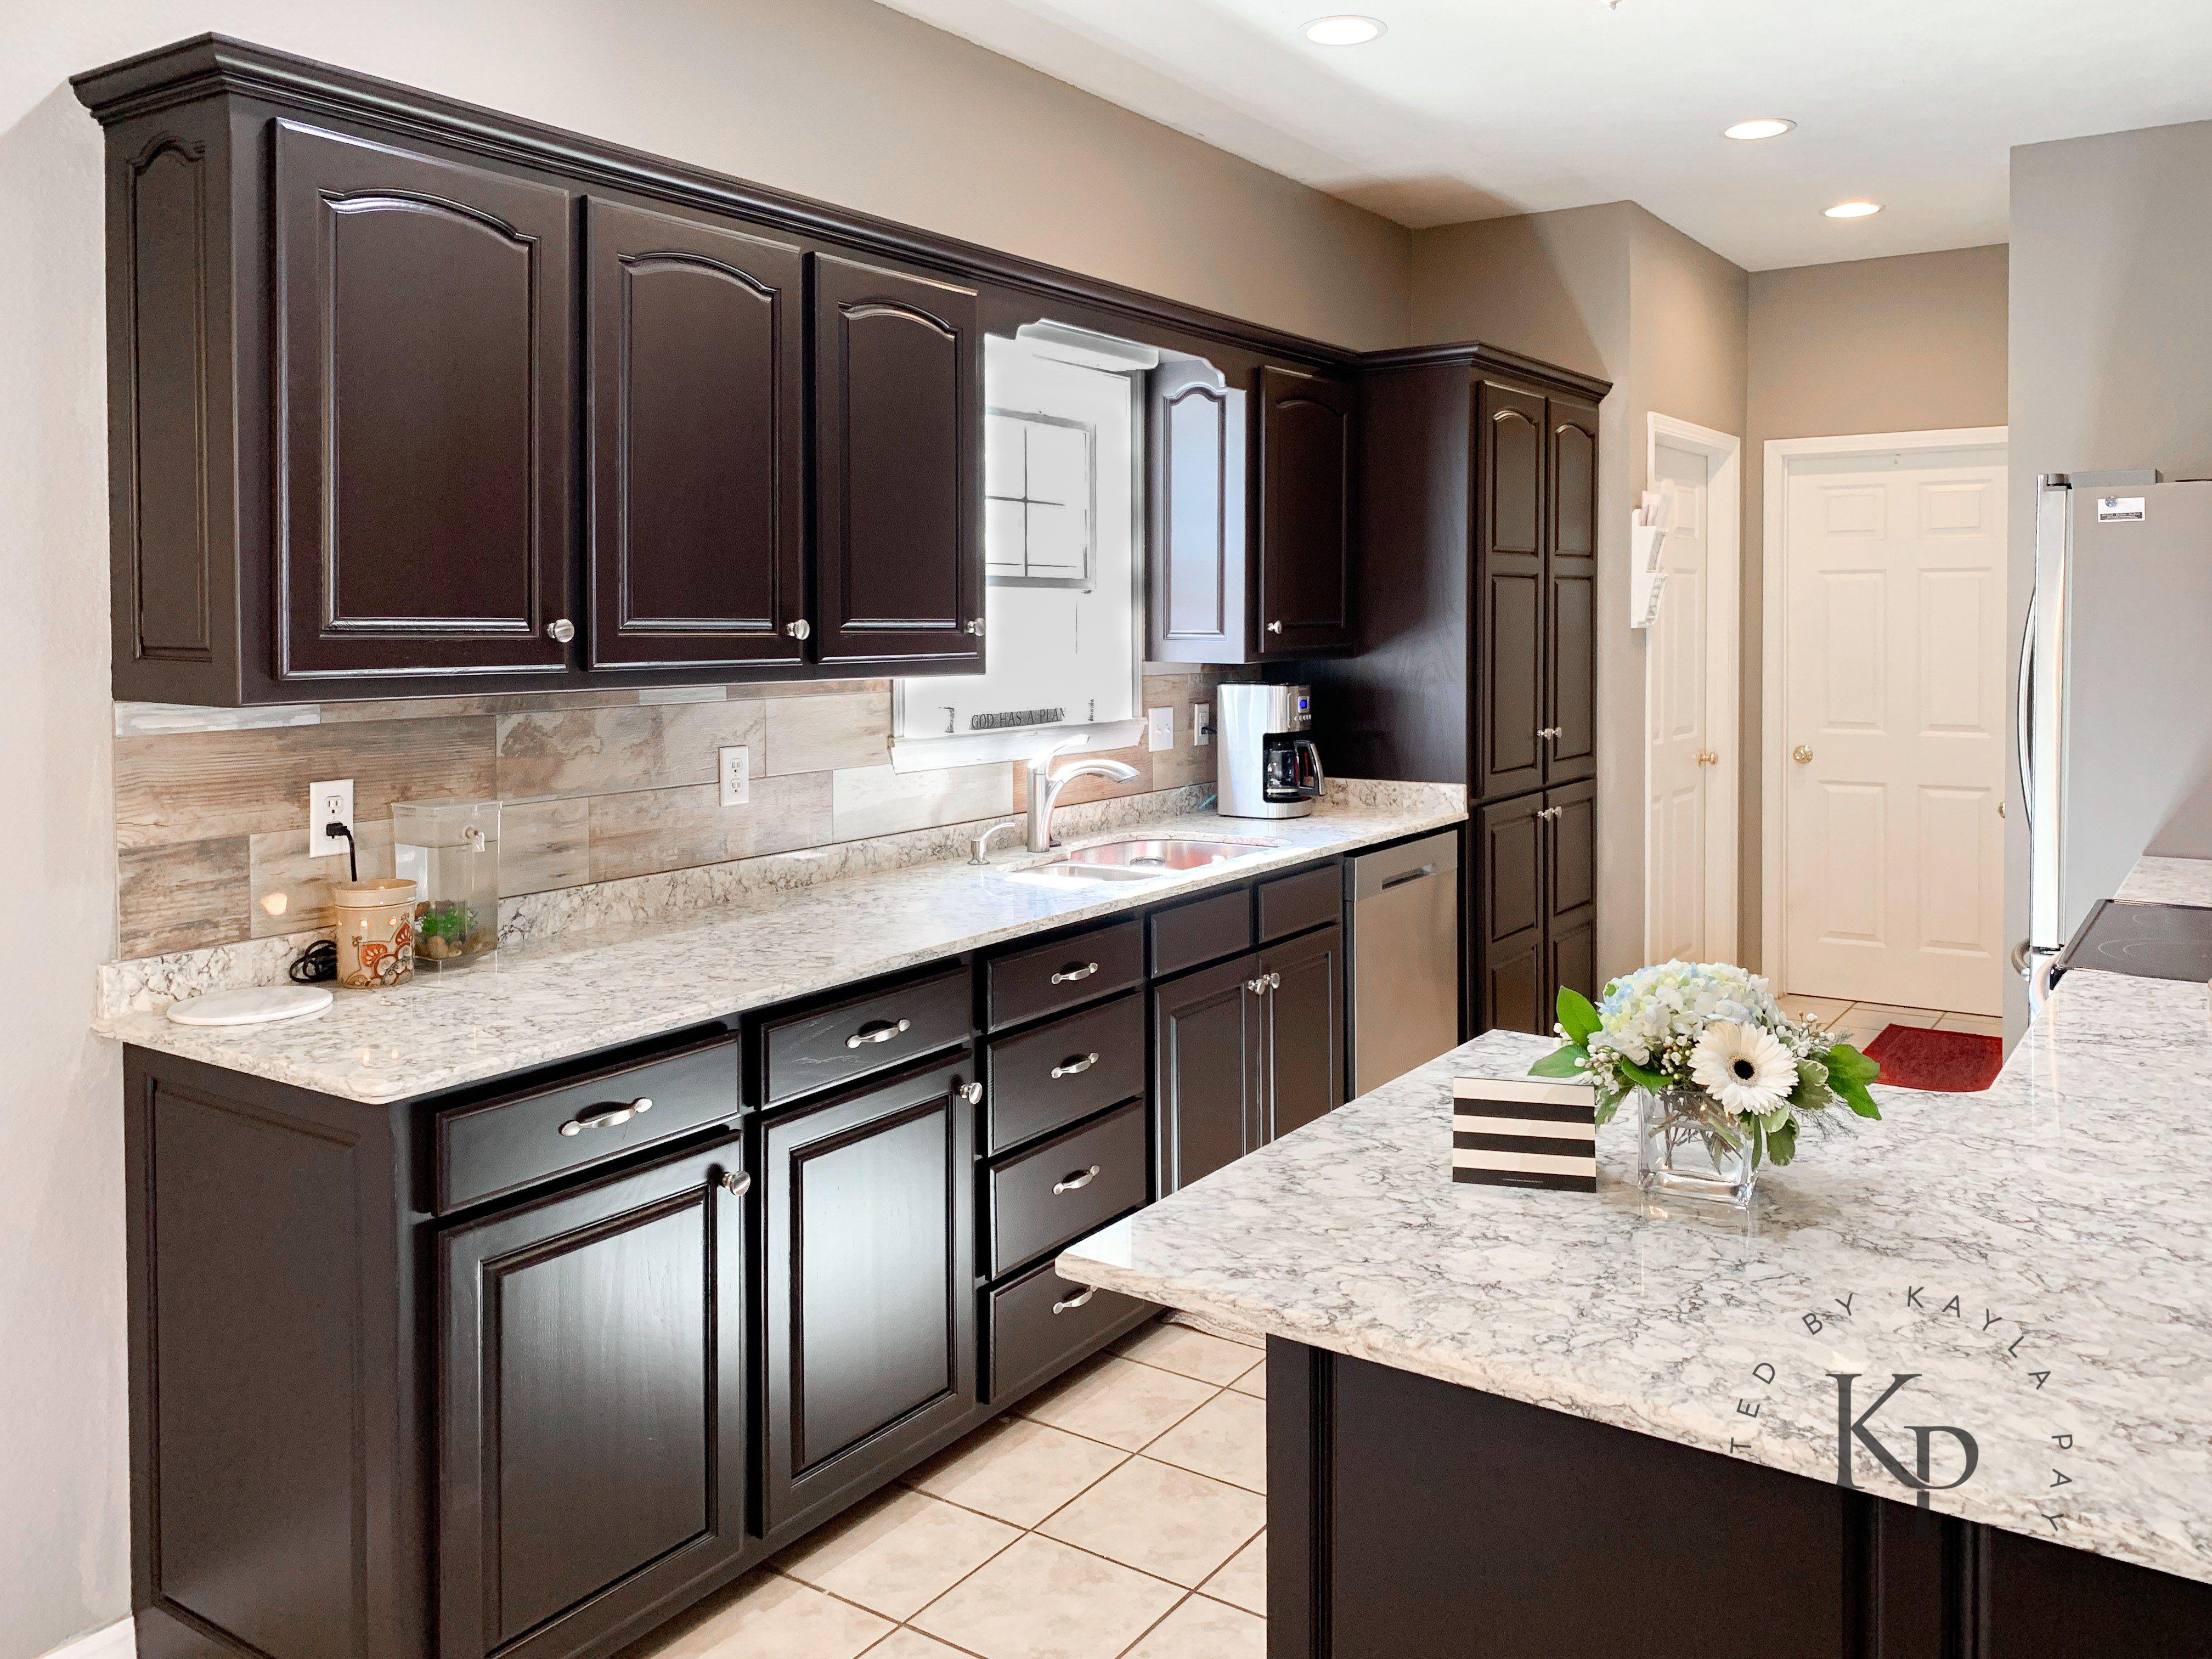 It S True Not Everyone Wants White Kitchen Cabinets Dark Kitchen Cabinets Espresso Kitchen Cabinets Kitchen Cabinets And Countertops